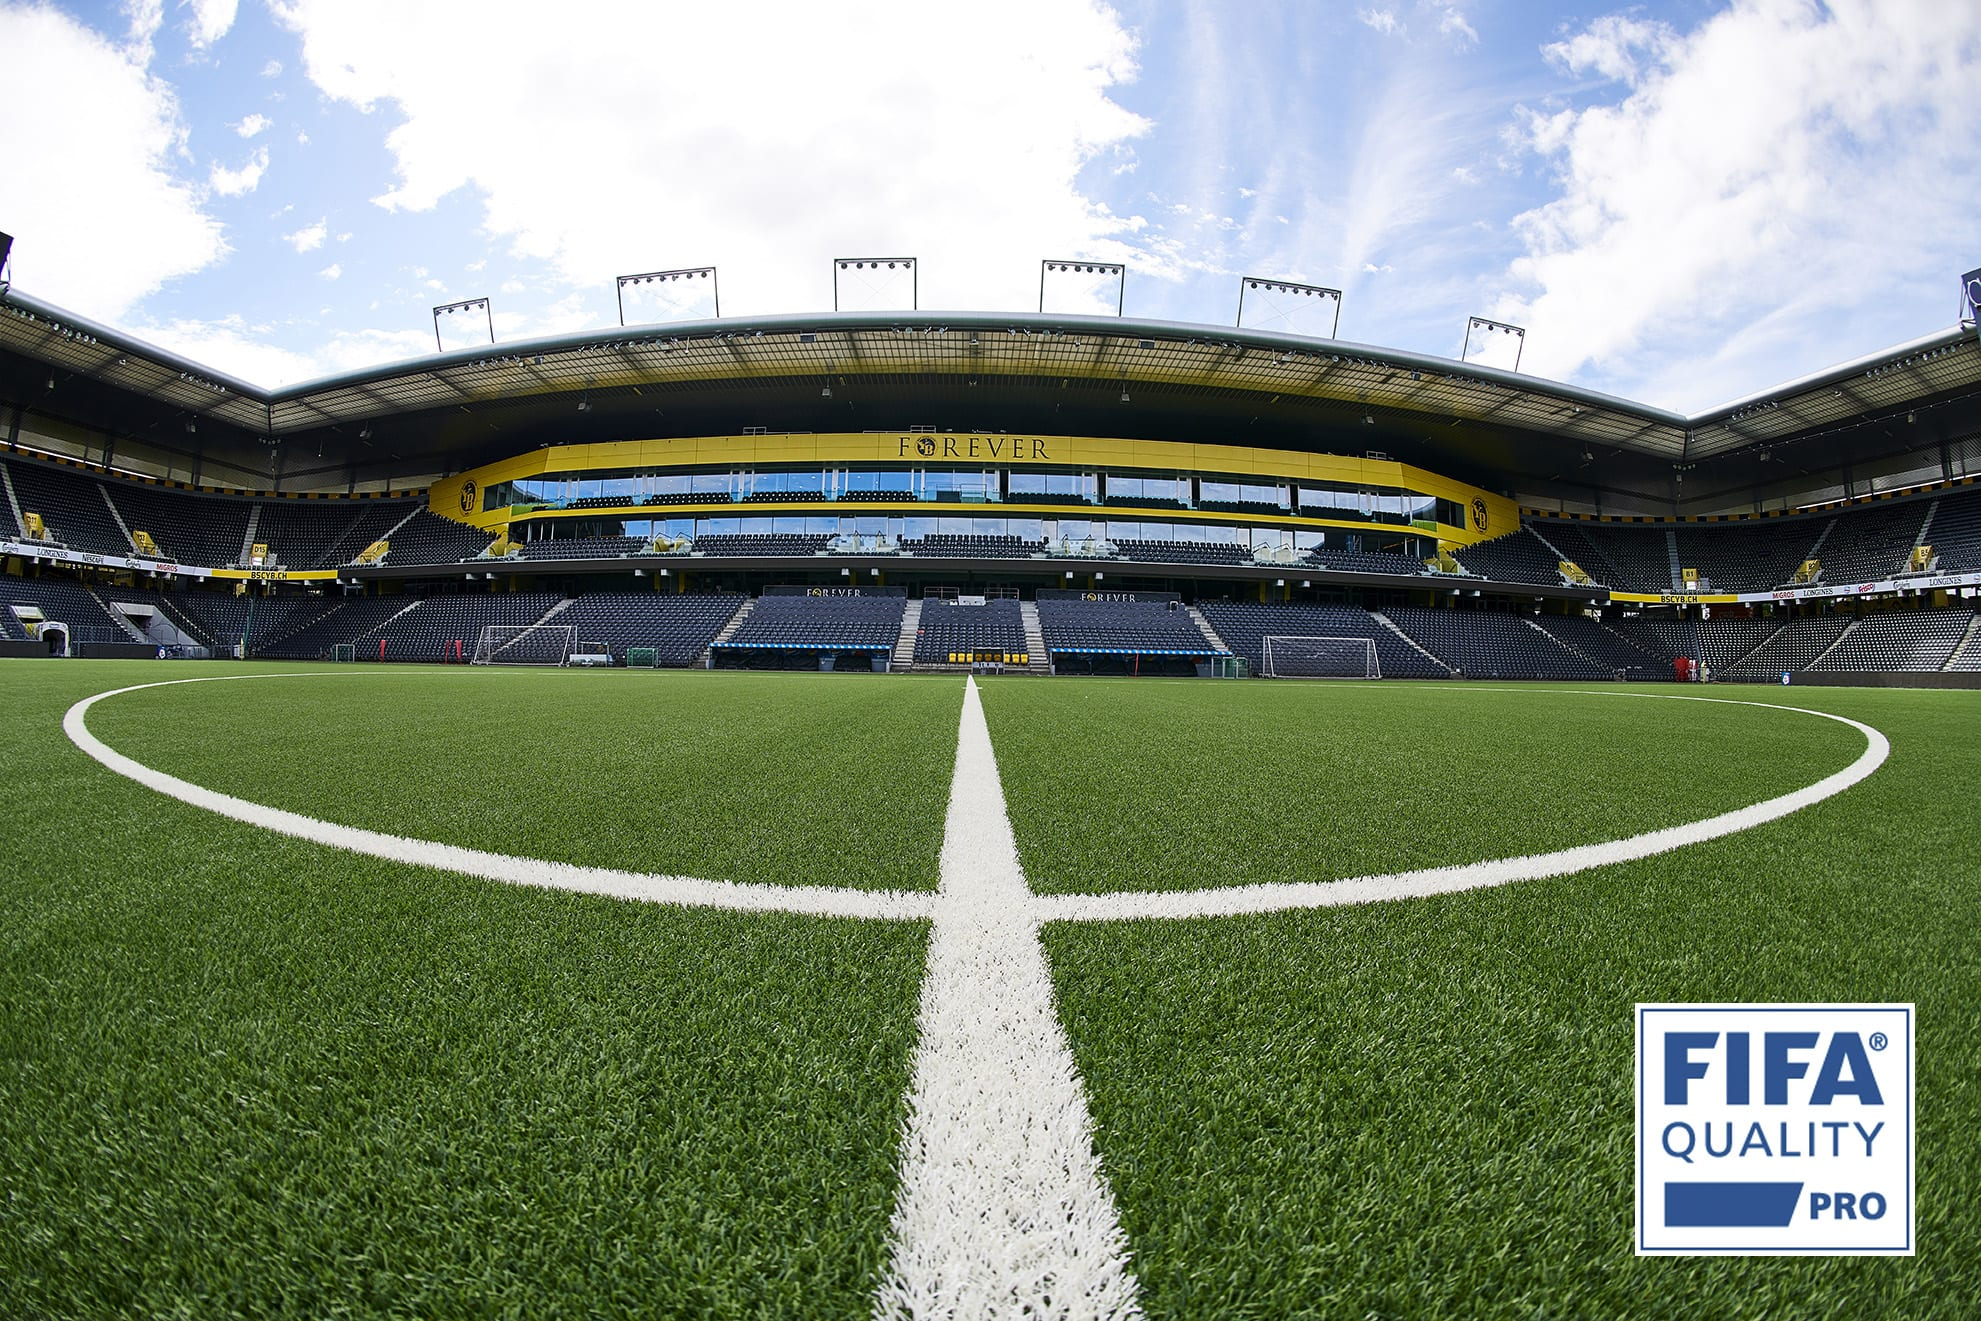 Wankdorfstadion, Schweiz, FIFA Quality Pro